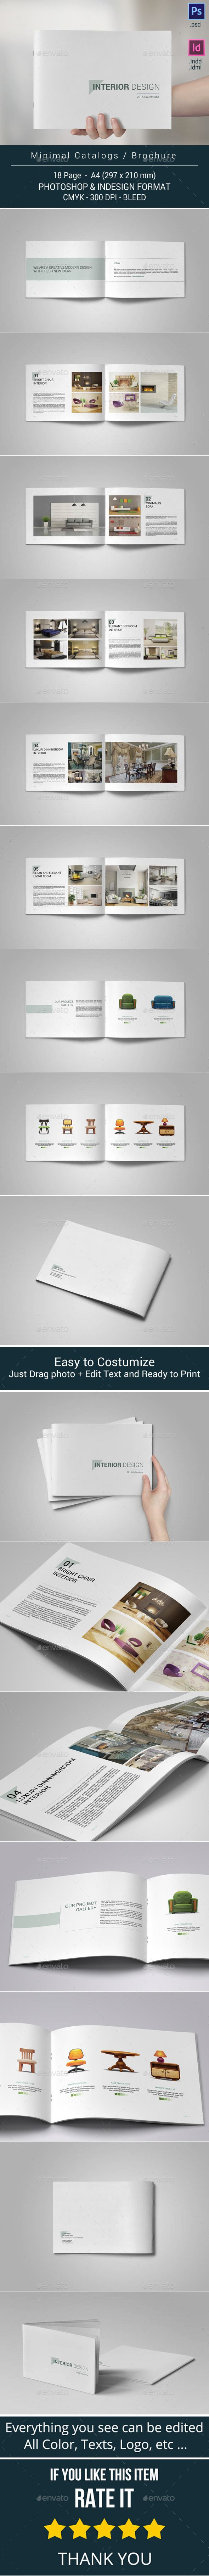 Multipurpose Catalogs / Brochure / Portfolio Design Tempalte #brochure Download: http://graphicriver.net/item/multipurpose-catalogs-brochure-portfolio/10402343?ref=ksioks